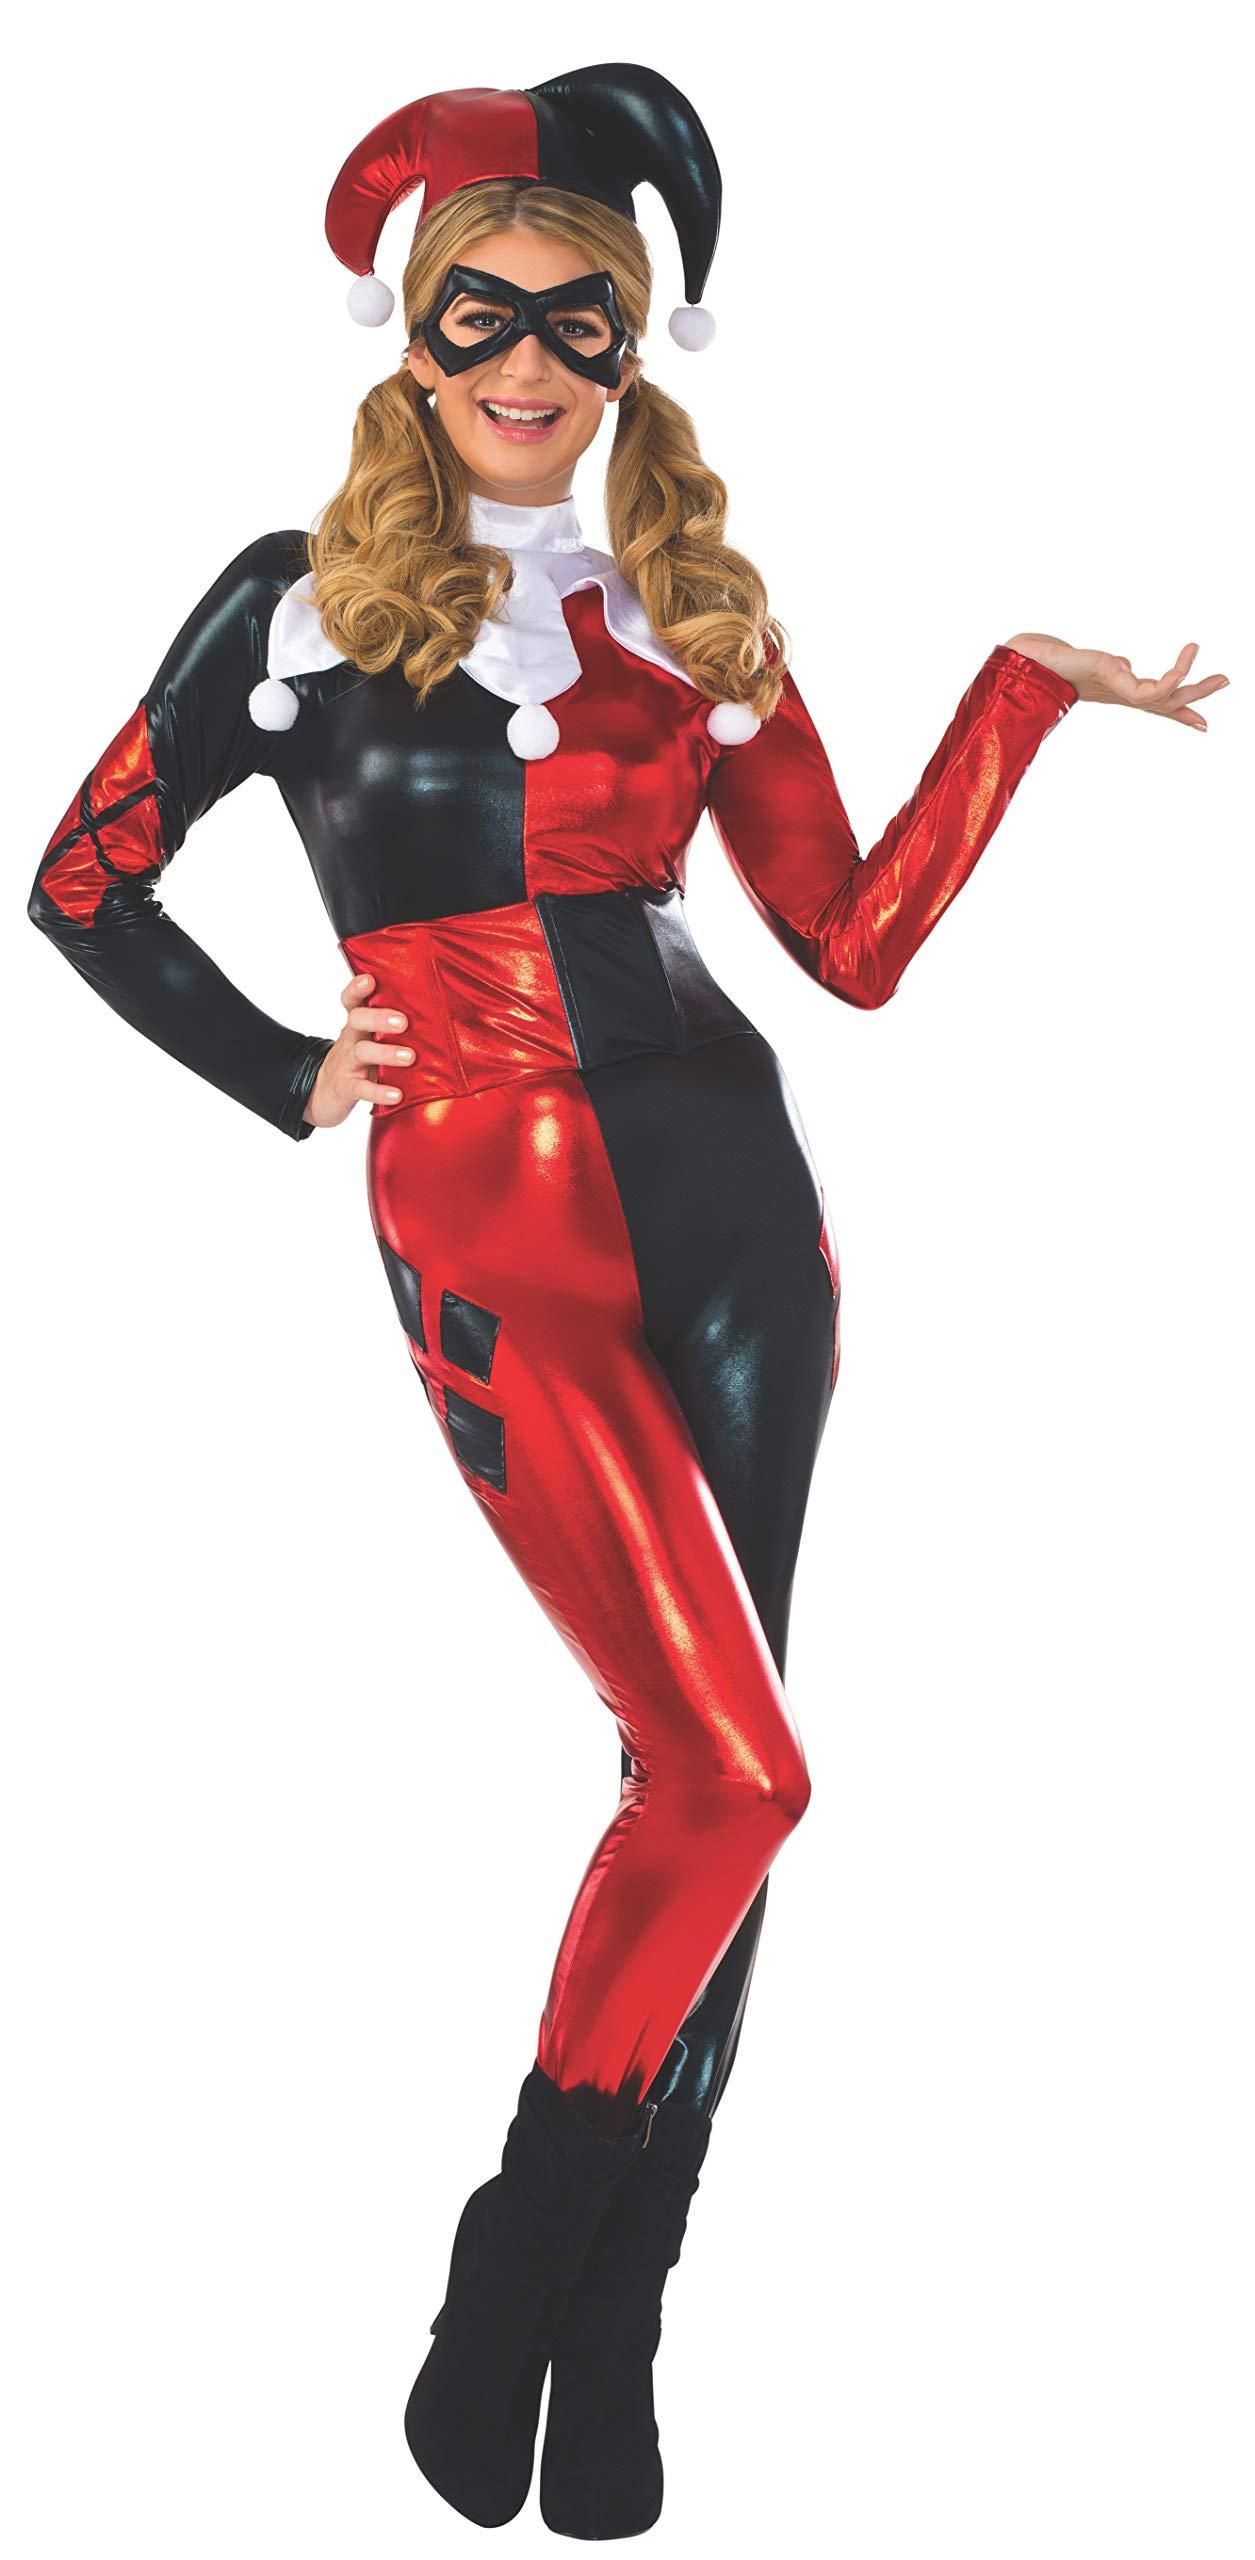 DC Comics Harley Quinn Deluxe Jumpsuit Costume